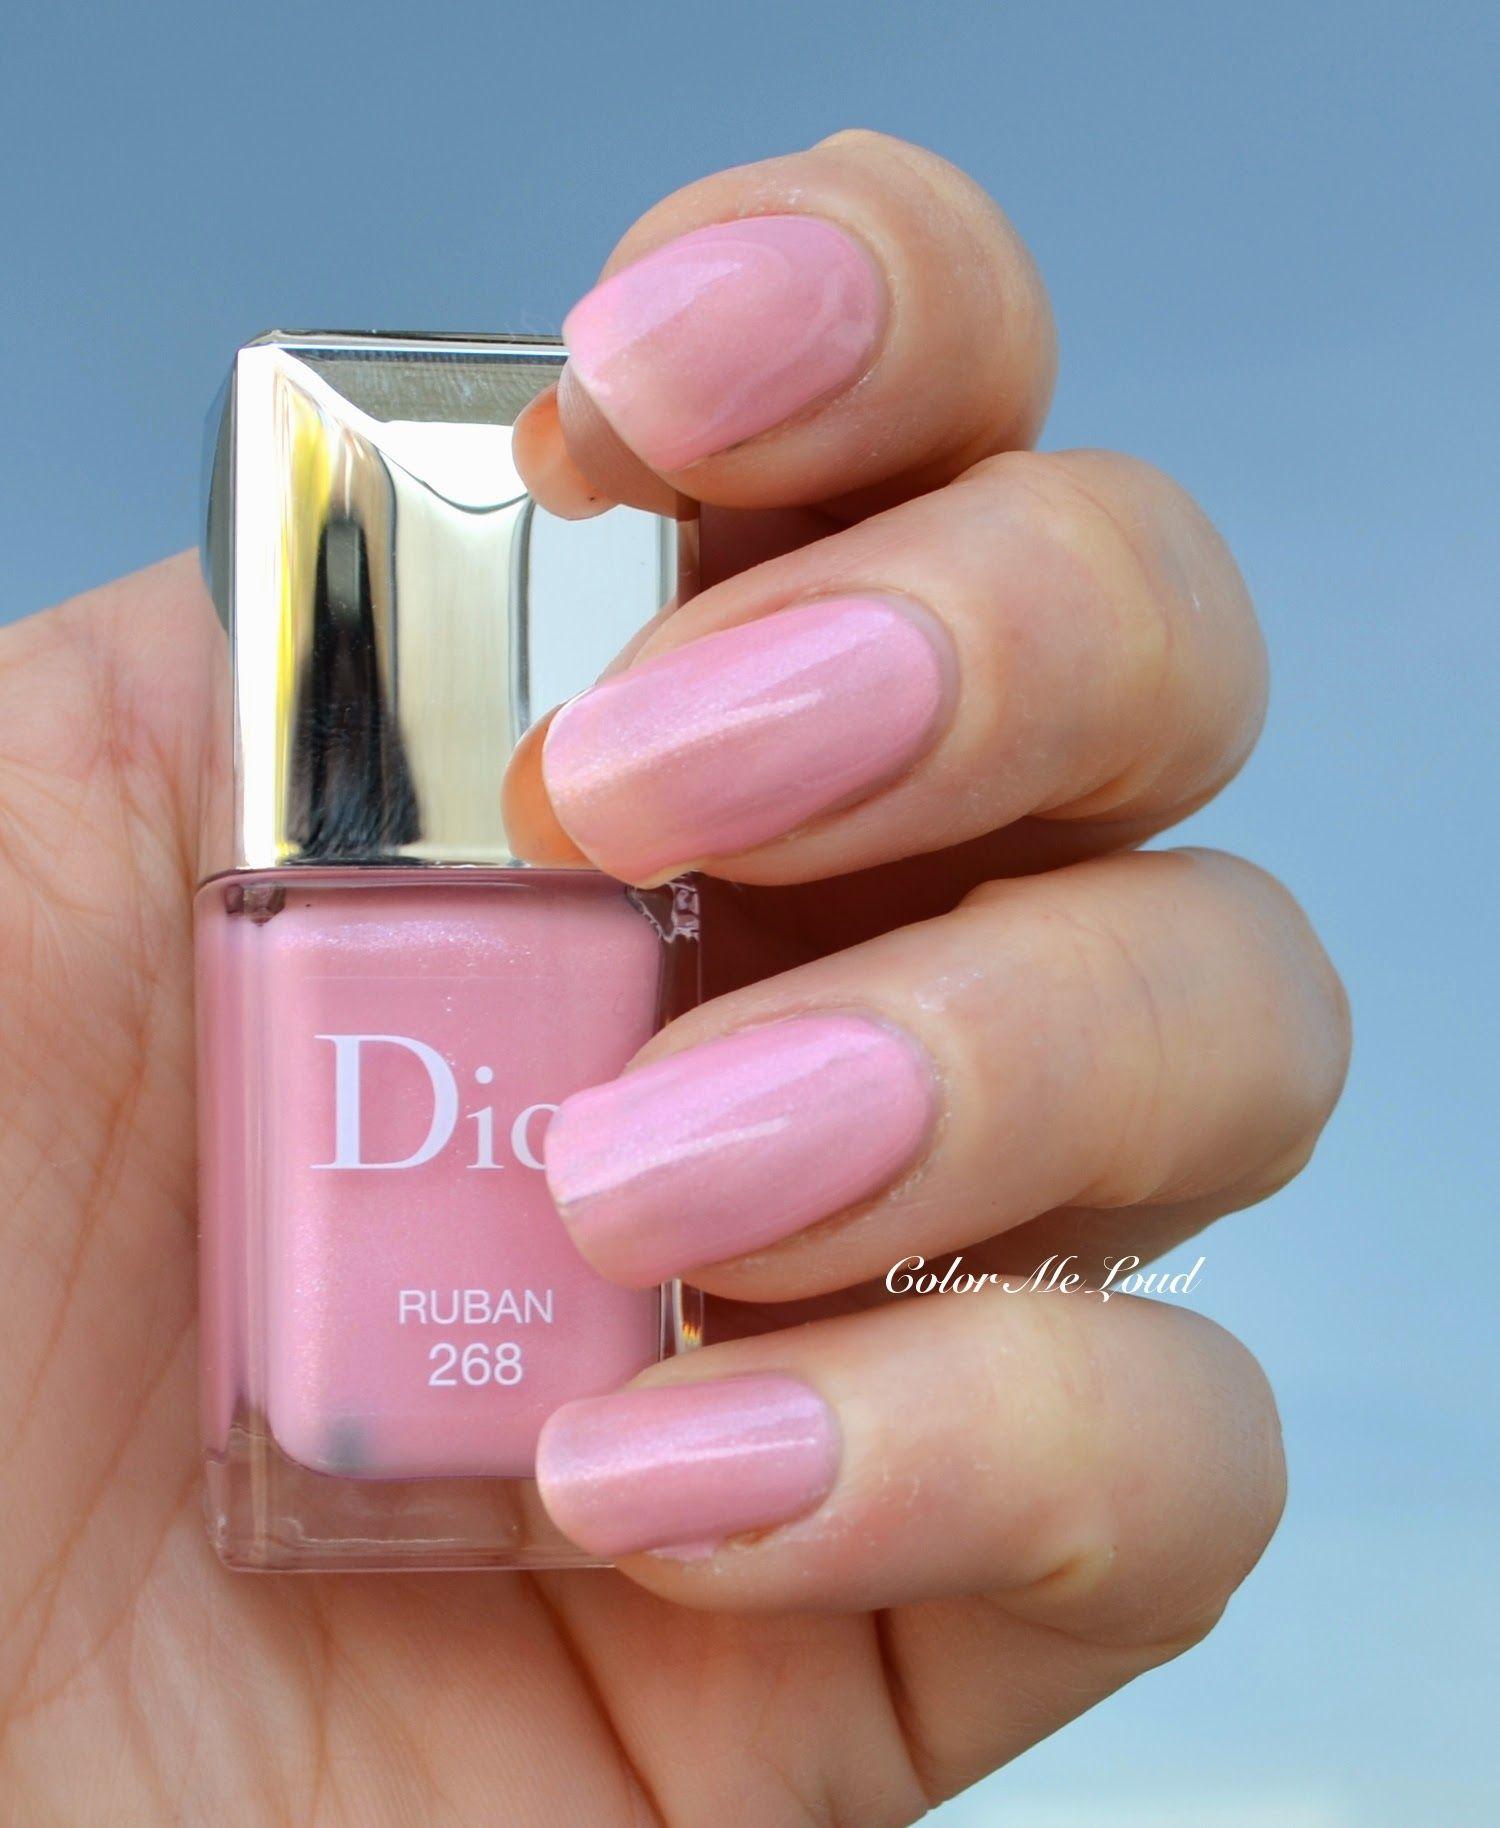 Dior Vernis #268 Ruban Gel Effect Nail Polish | SWATCHES | Pinterest